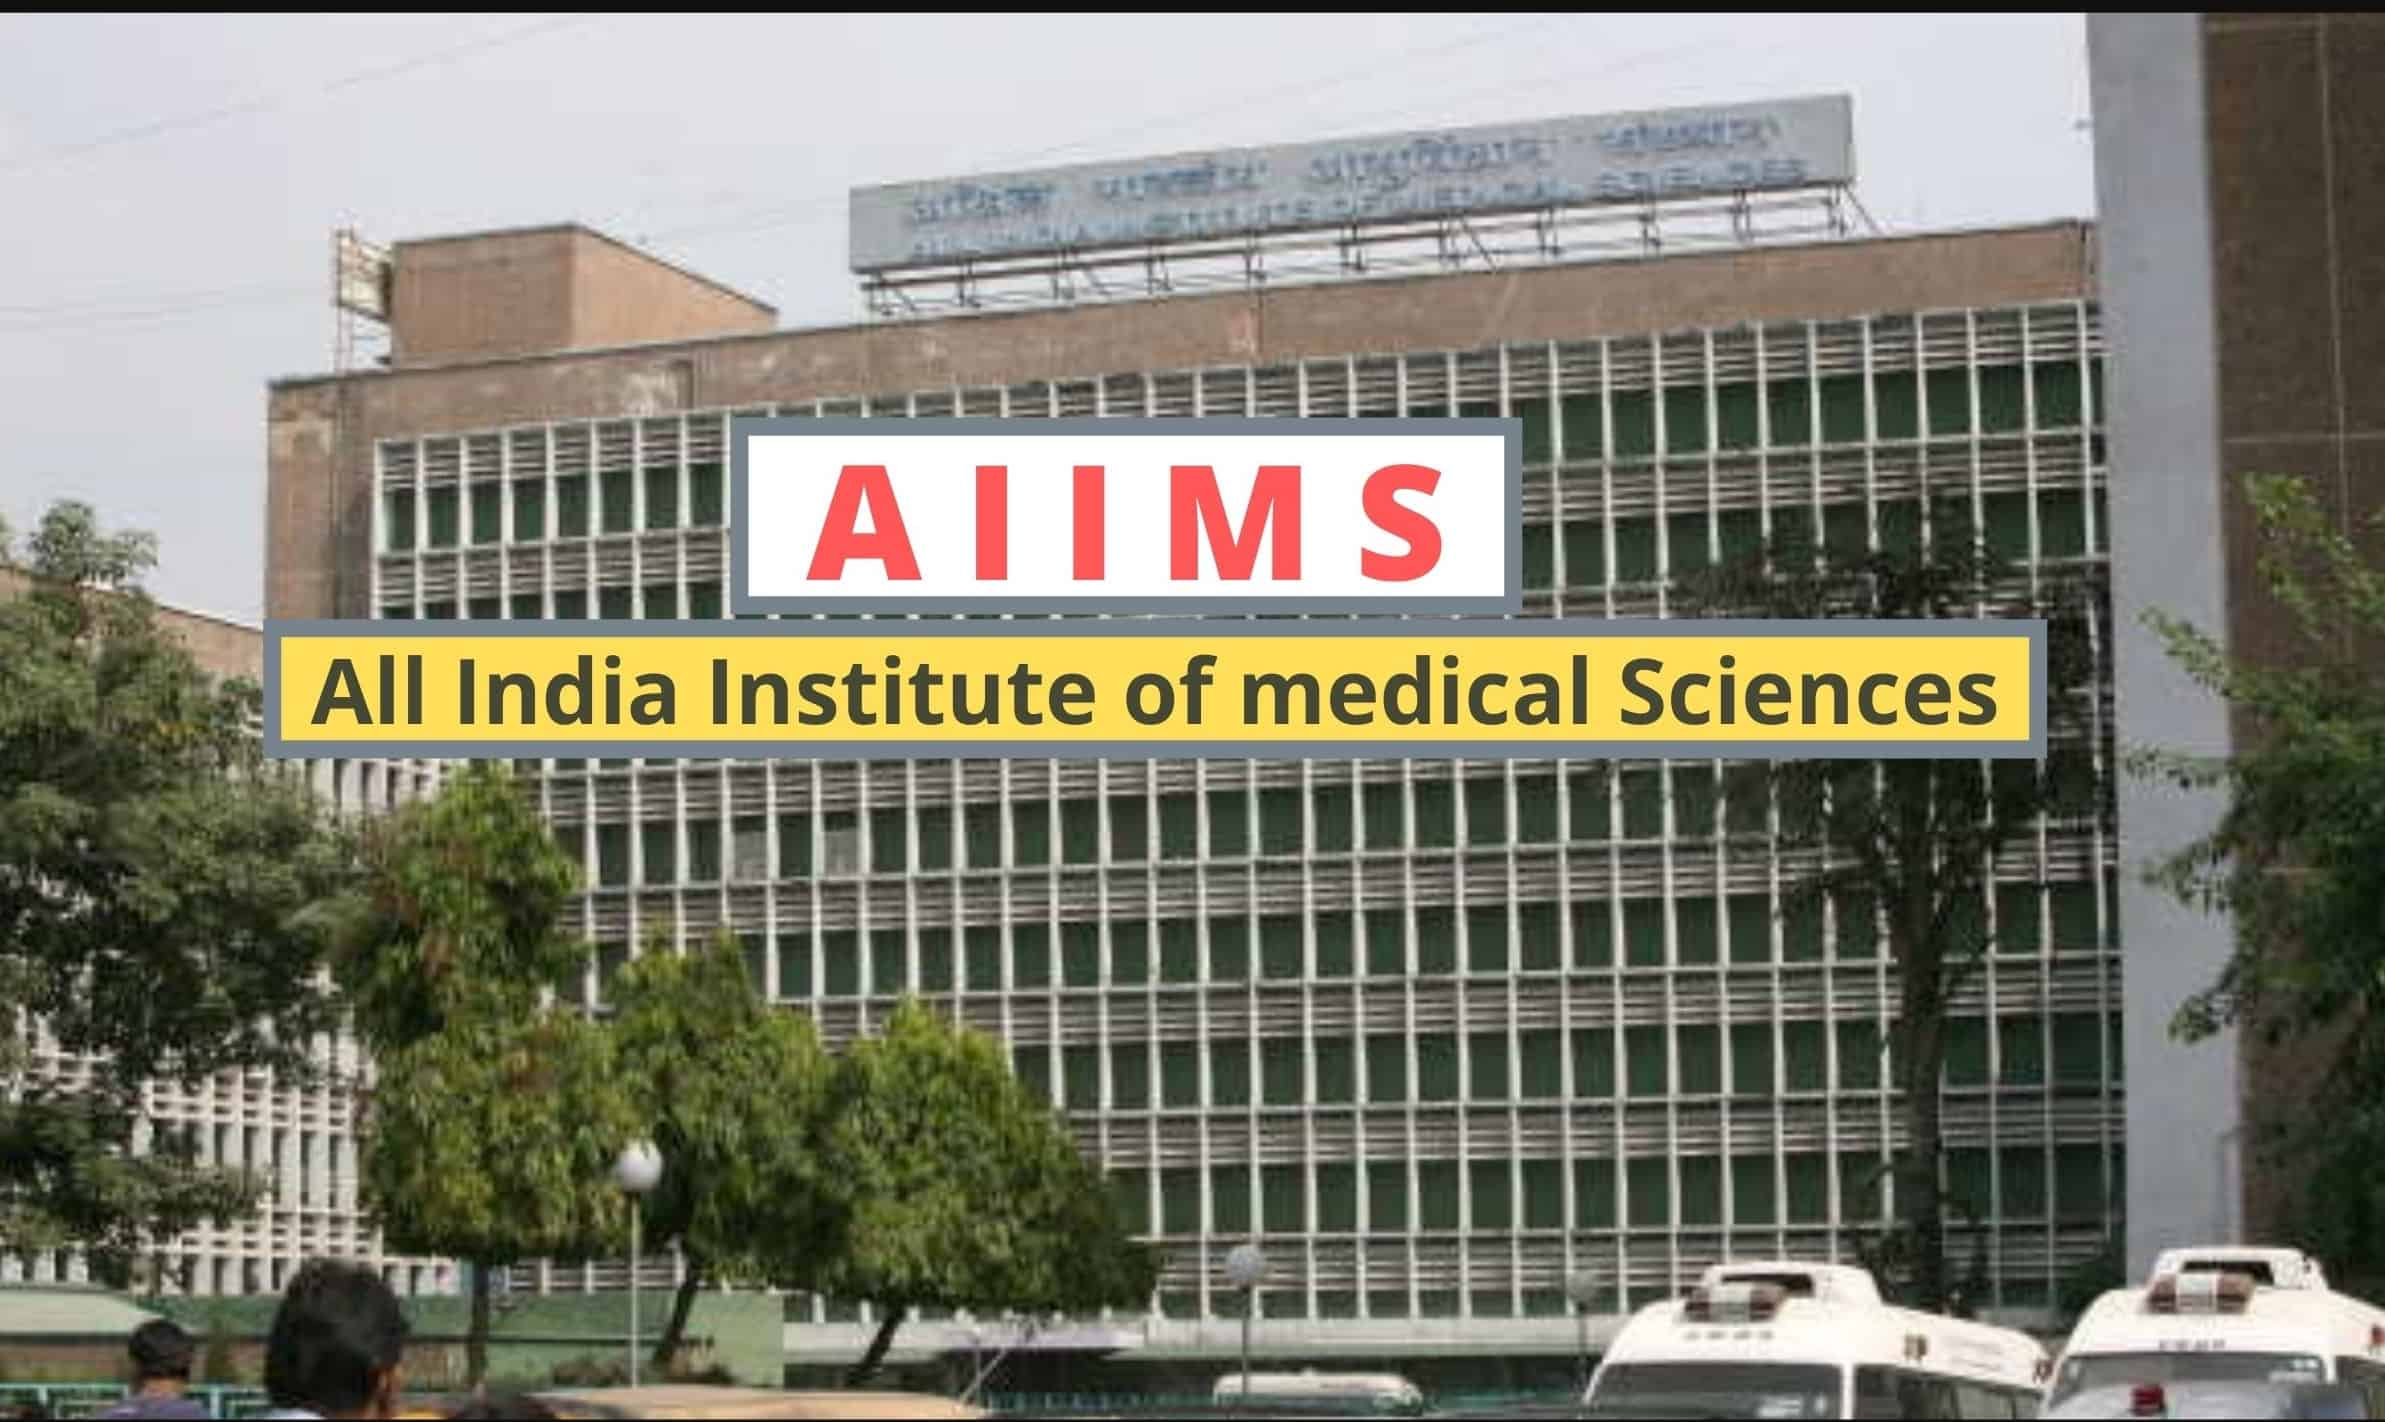 AIIMS Hospital